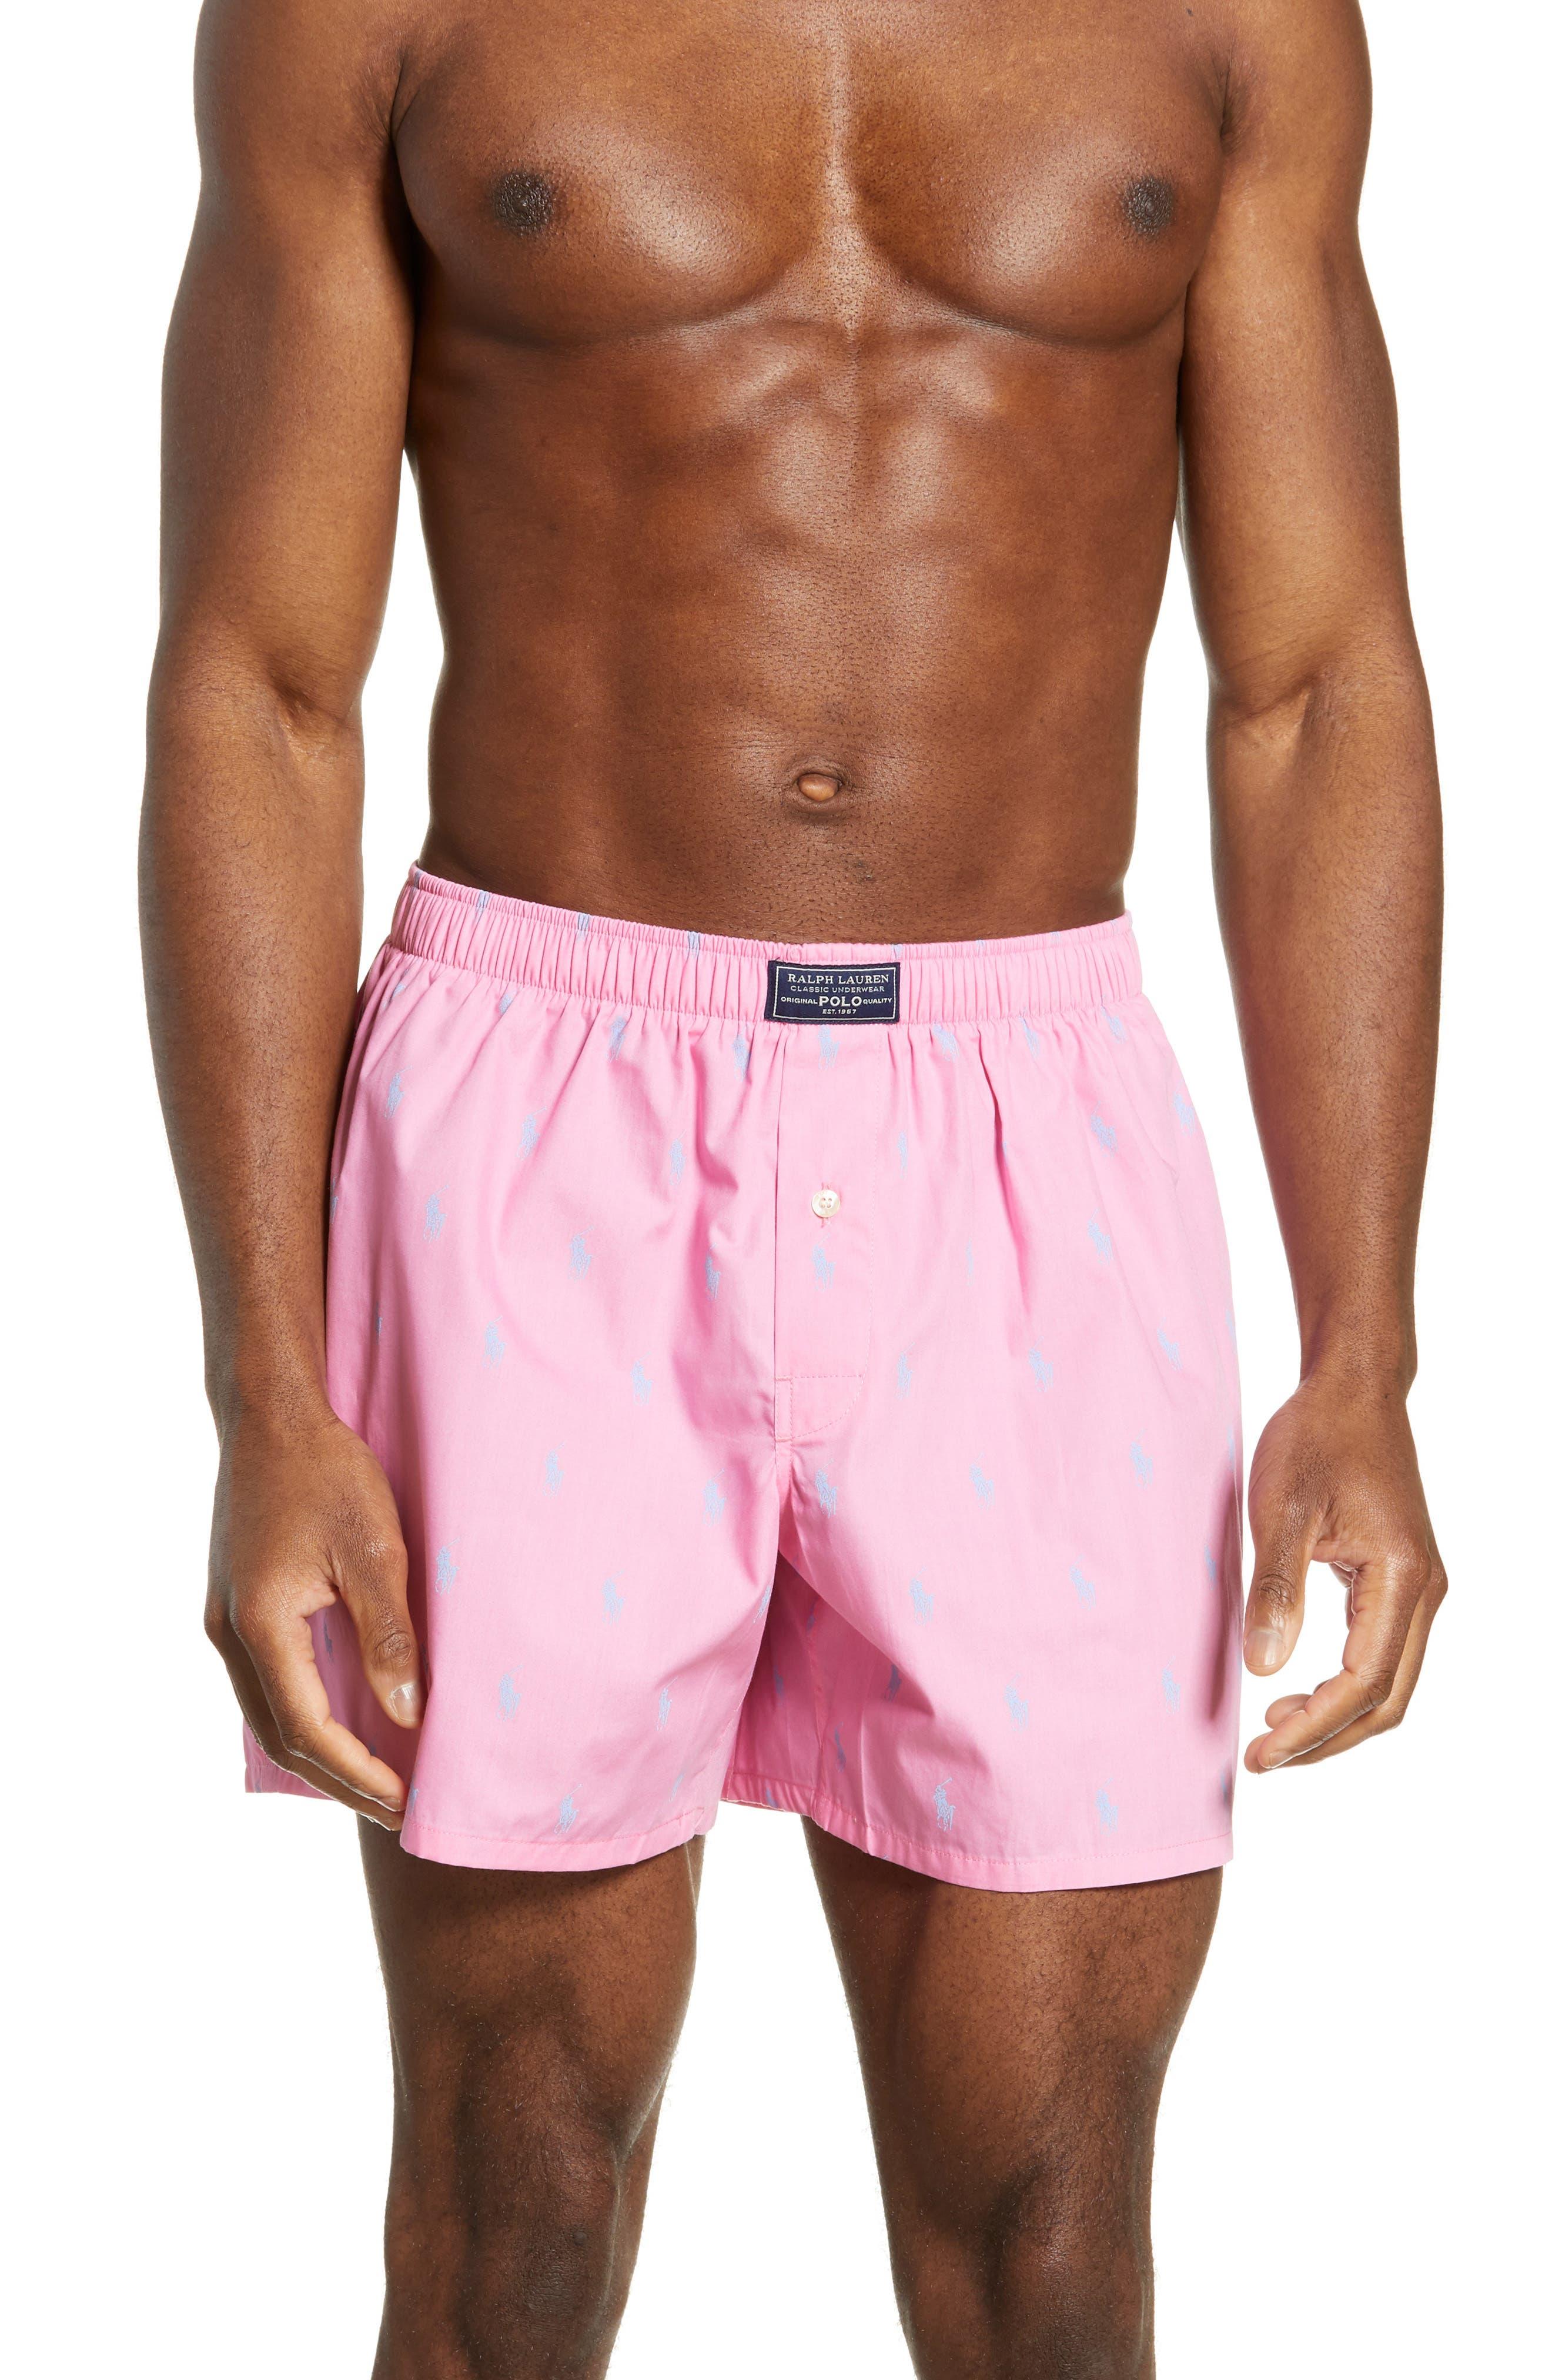 737a66a9975c Men's Polo Ralph Lauren Underwear: Boxers, Briefs, Thongs & Trunks |  Nordstrom